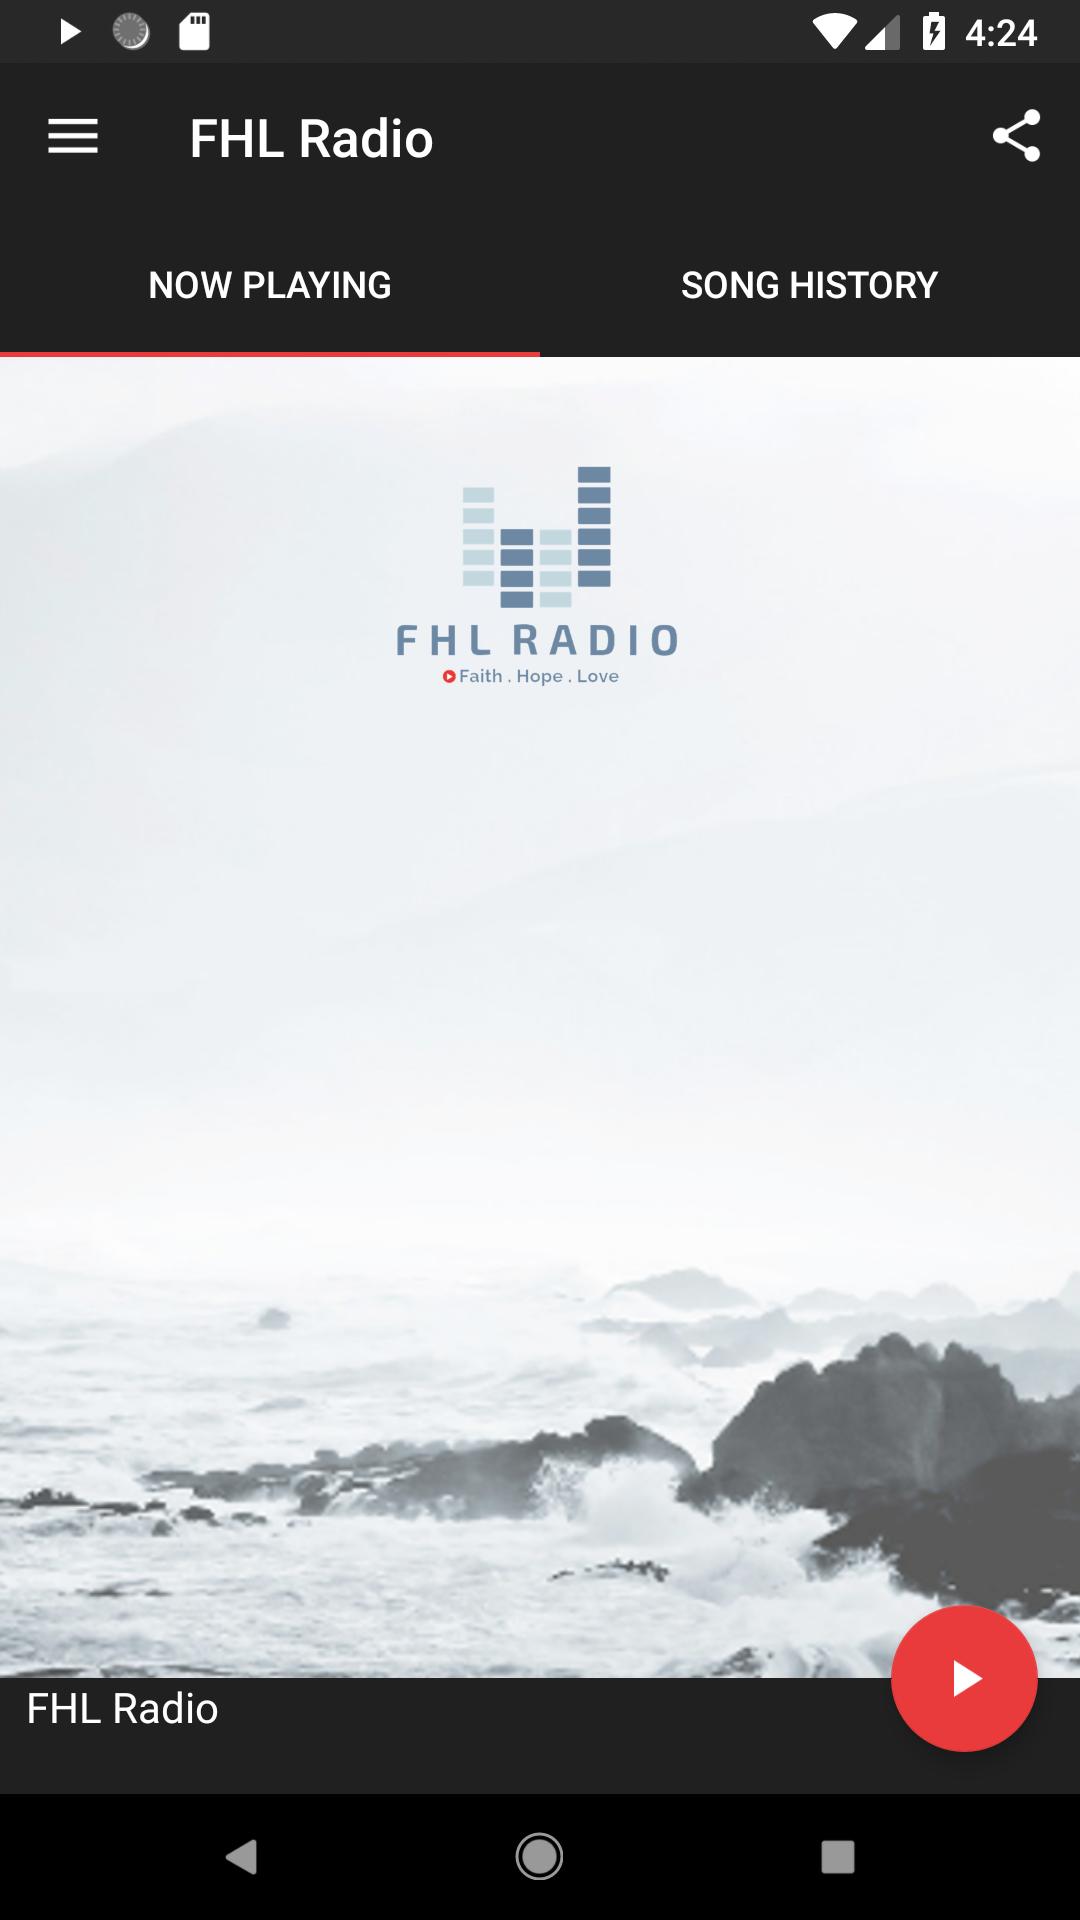 FHLRADIO Android App